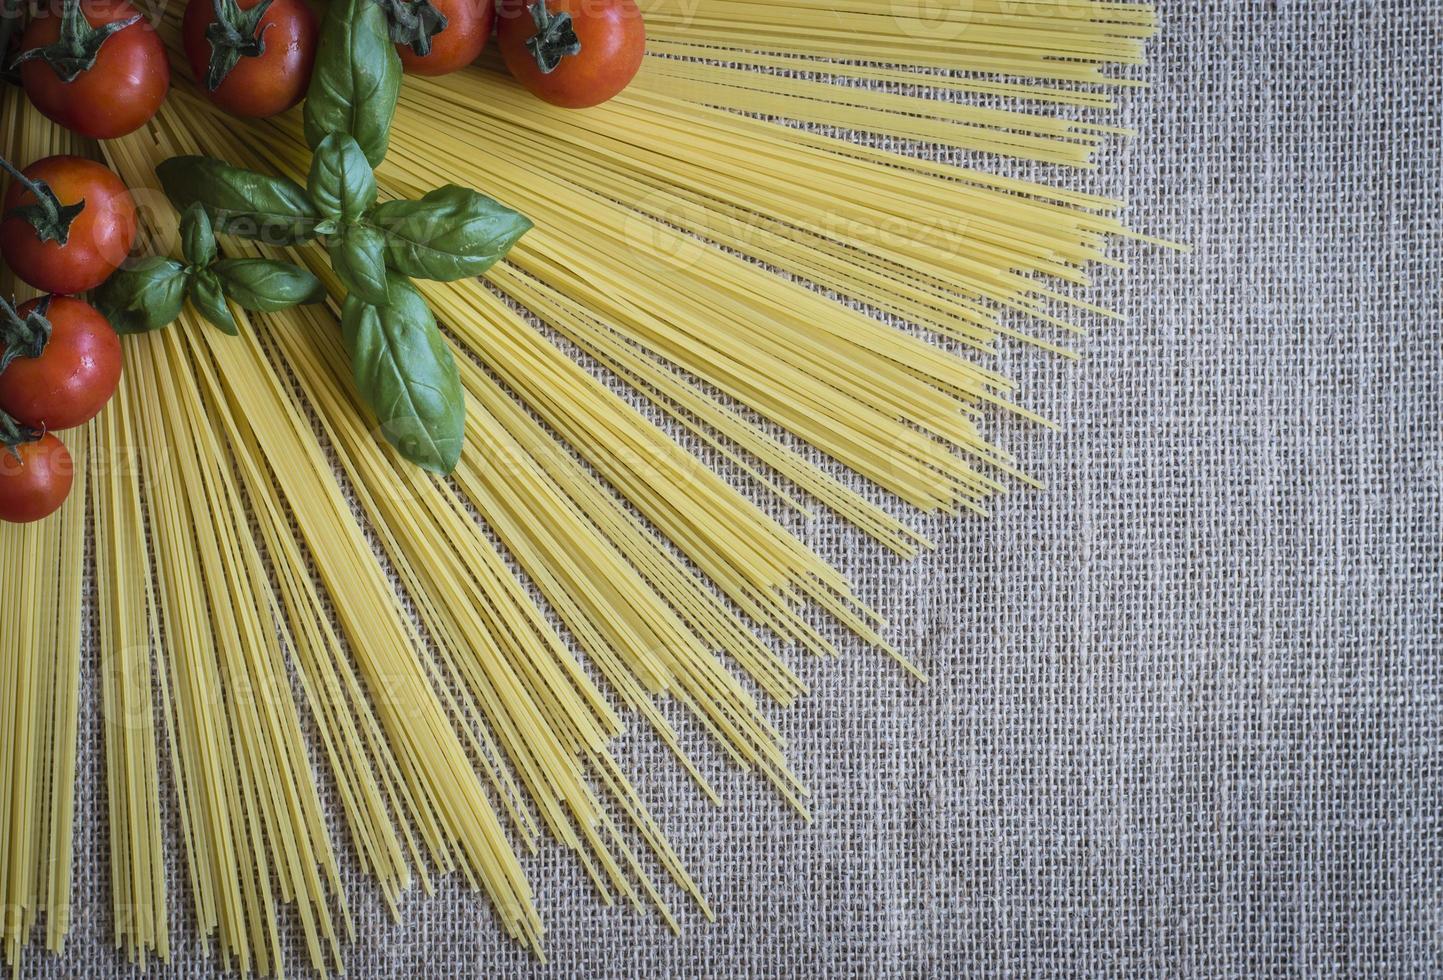 Spaghetti sunrays with cherry tomatoes and basil on jute fabric photo